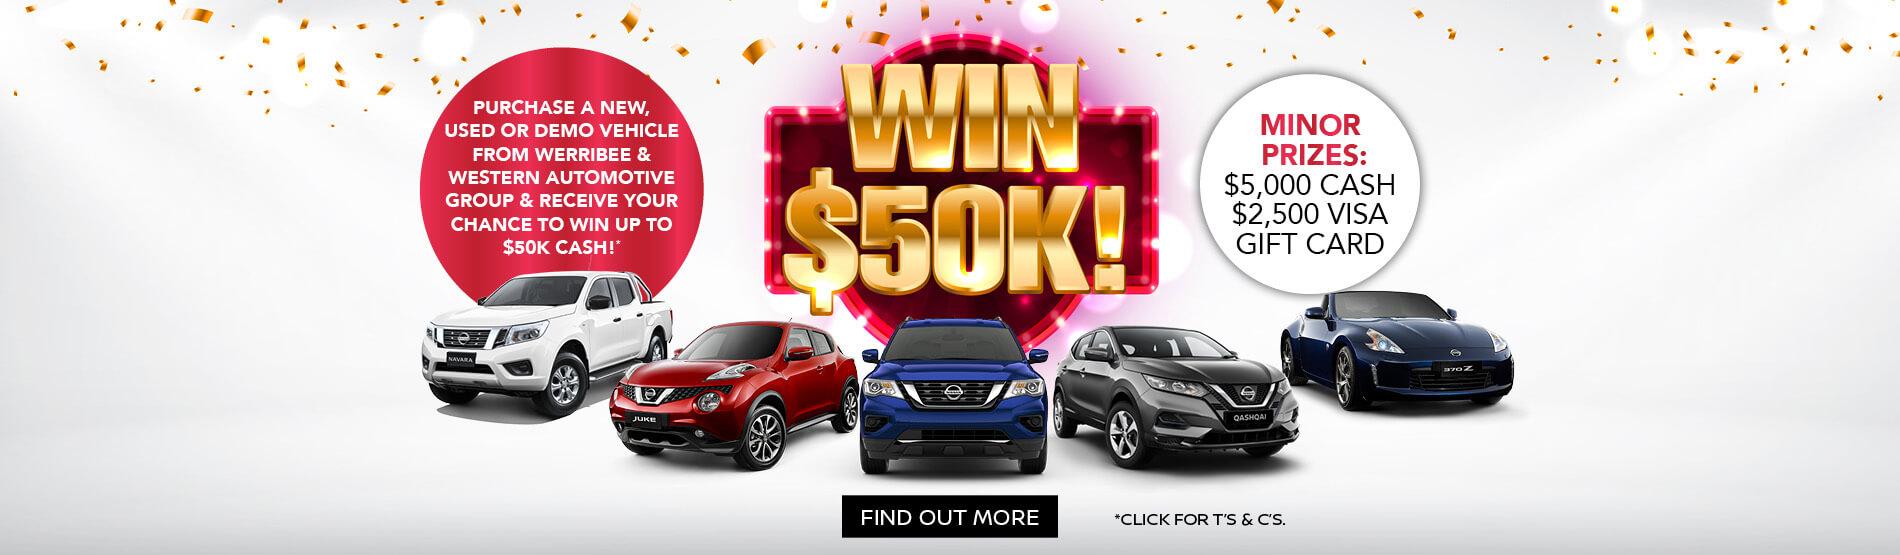 Werribee Nissan - $50K